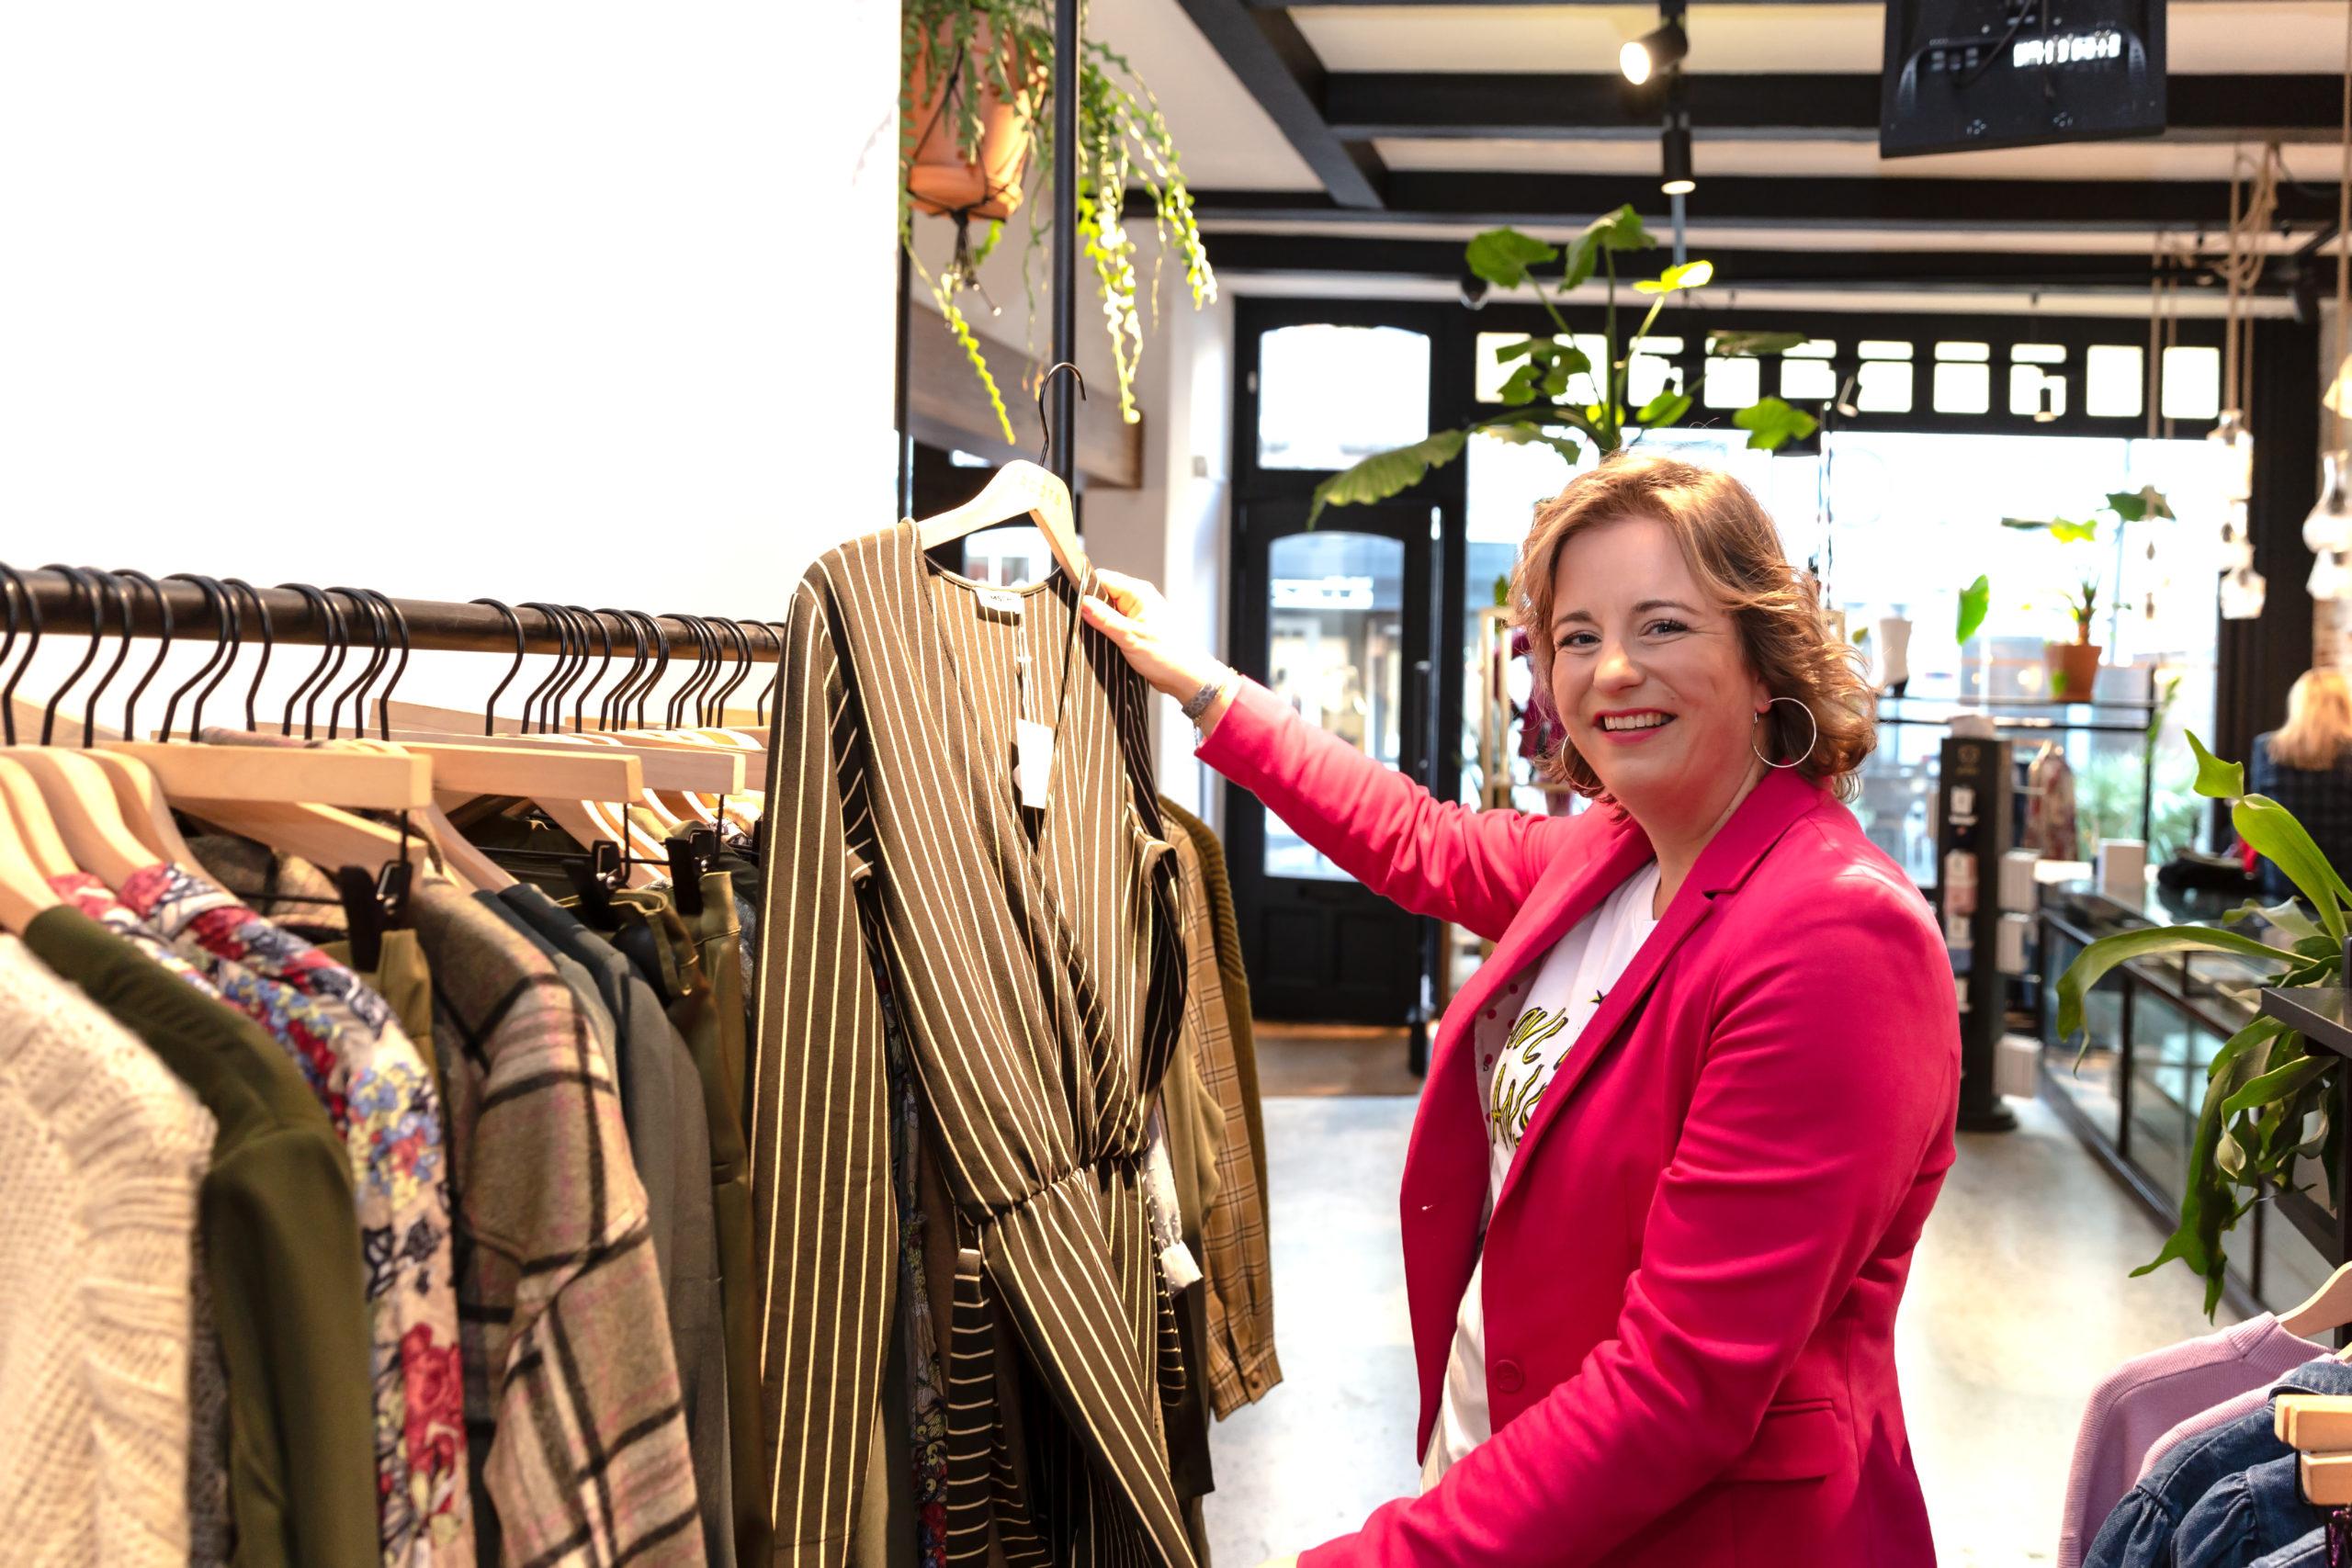 personal shopper personal shoppen kleuranalyse kledingadvies kleding make-over